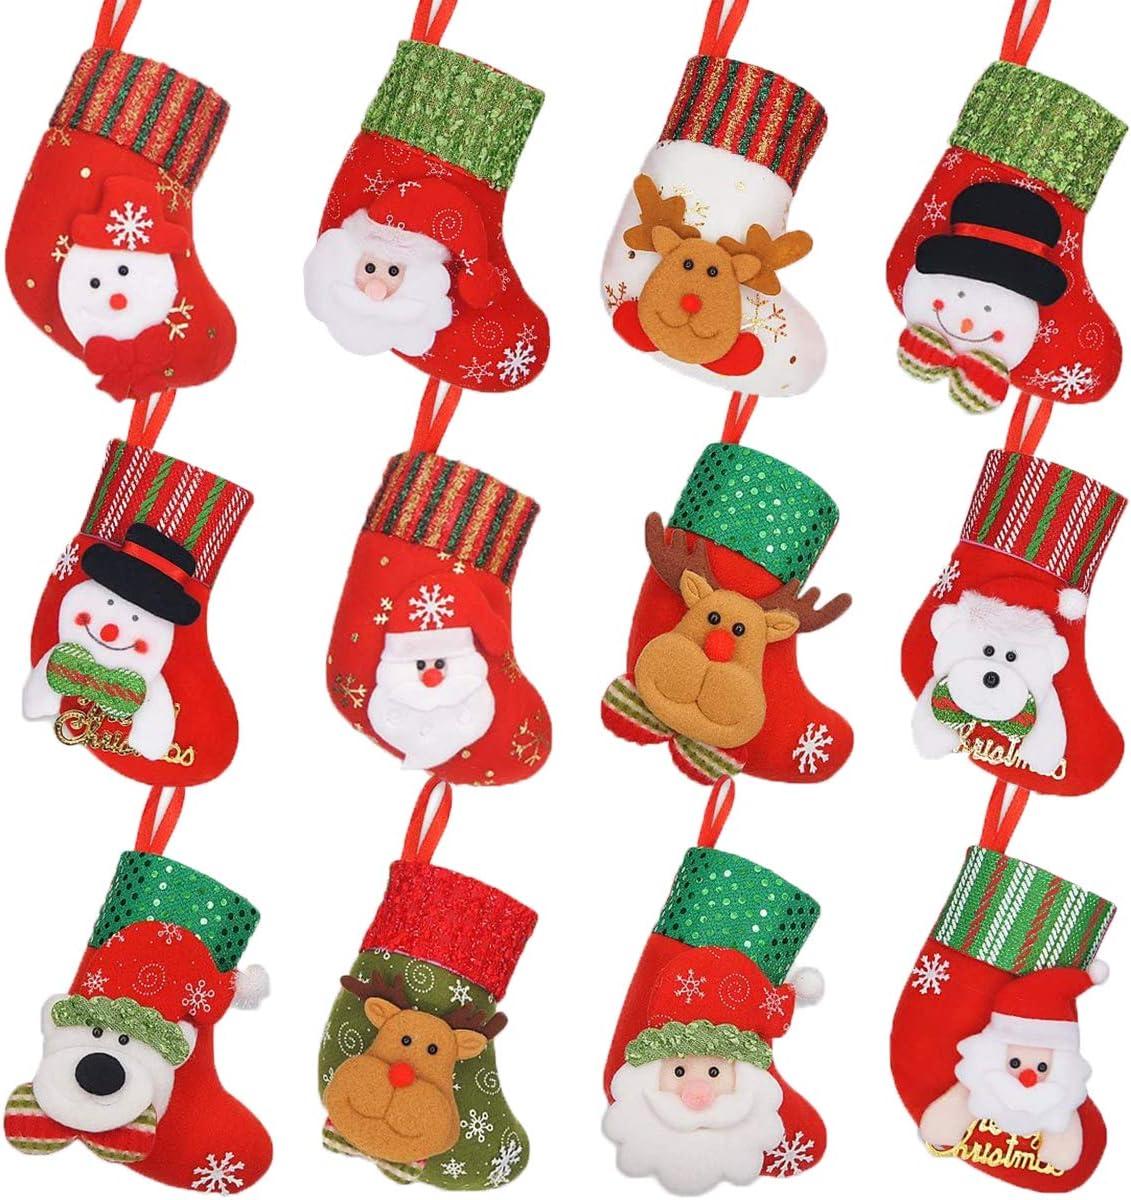 LimBridge Max 40% OFF Christmas Mini Stockings 12 Pack 3D Small inches Sacramento Mall 6.25